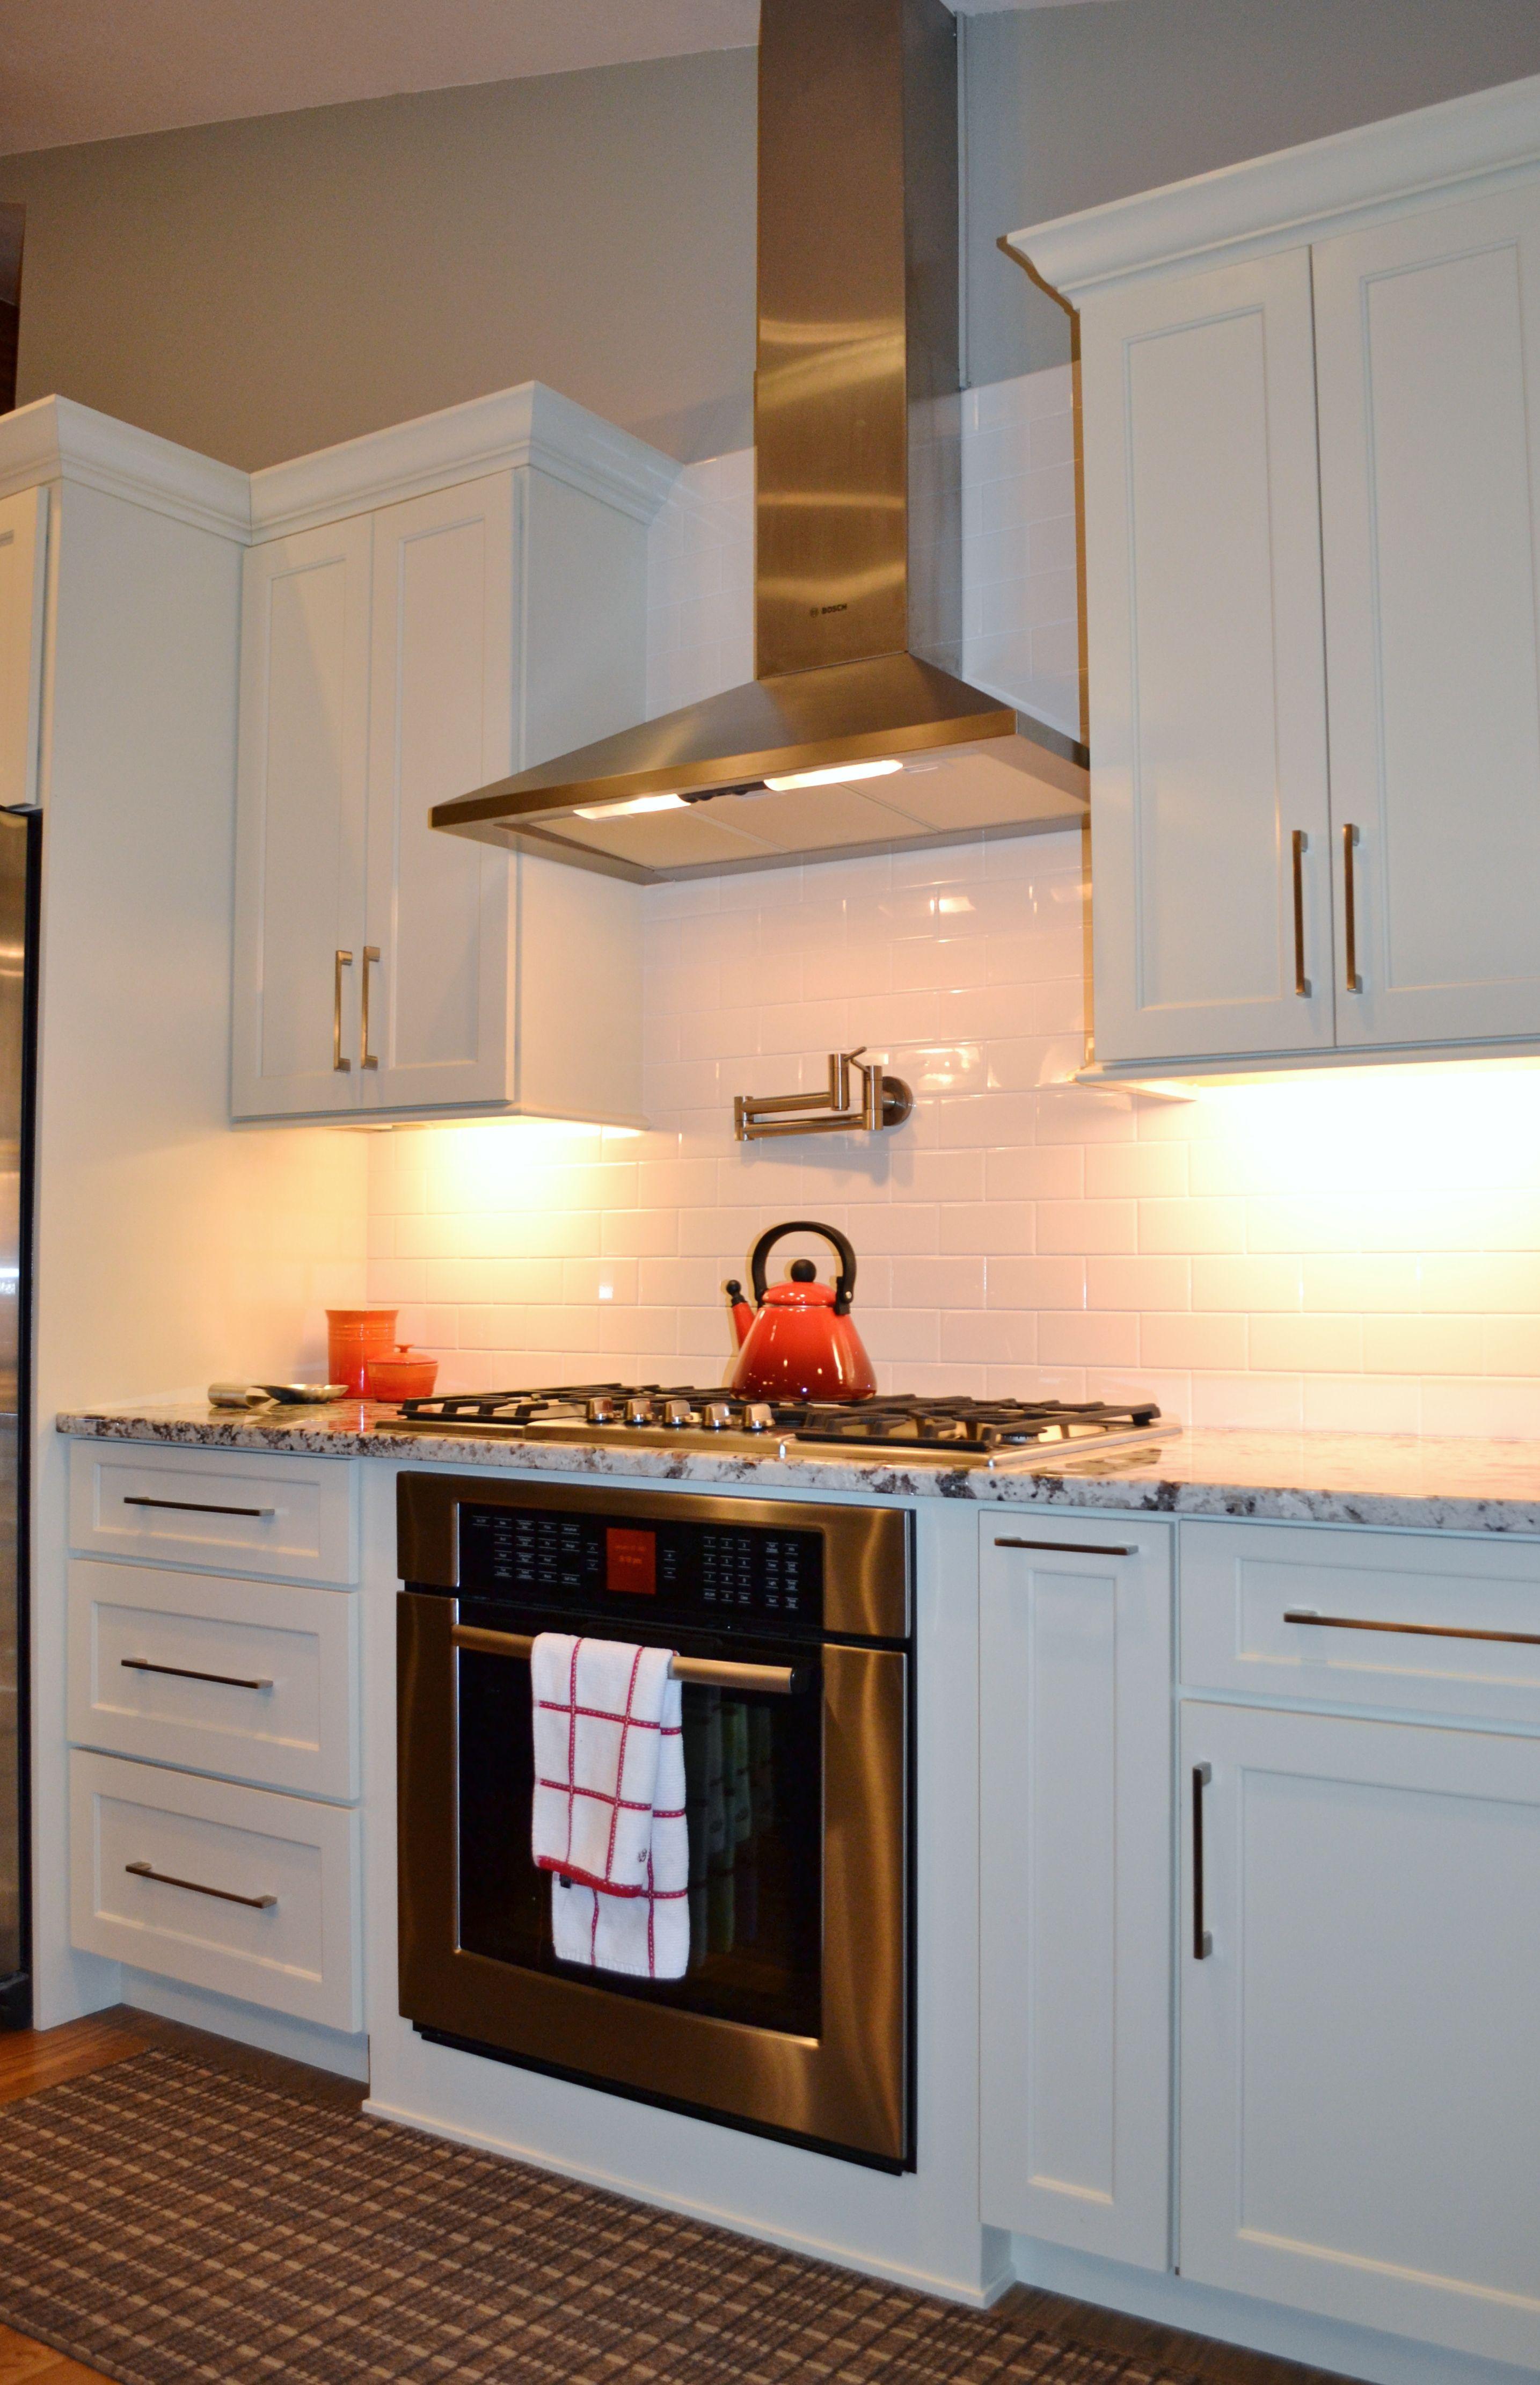 Small Range Hood Kitchen, bath remodeling, Kitchen, bath